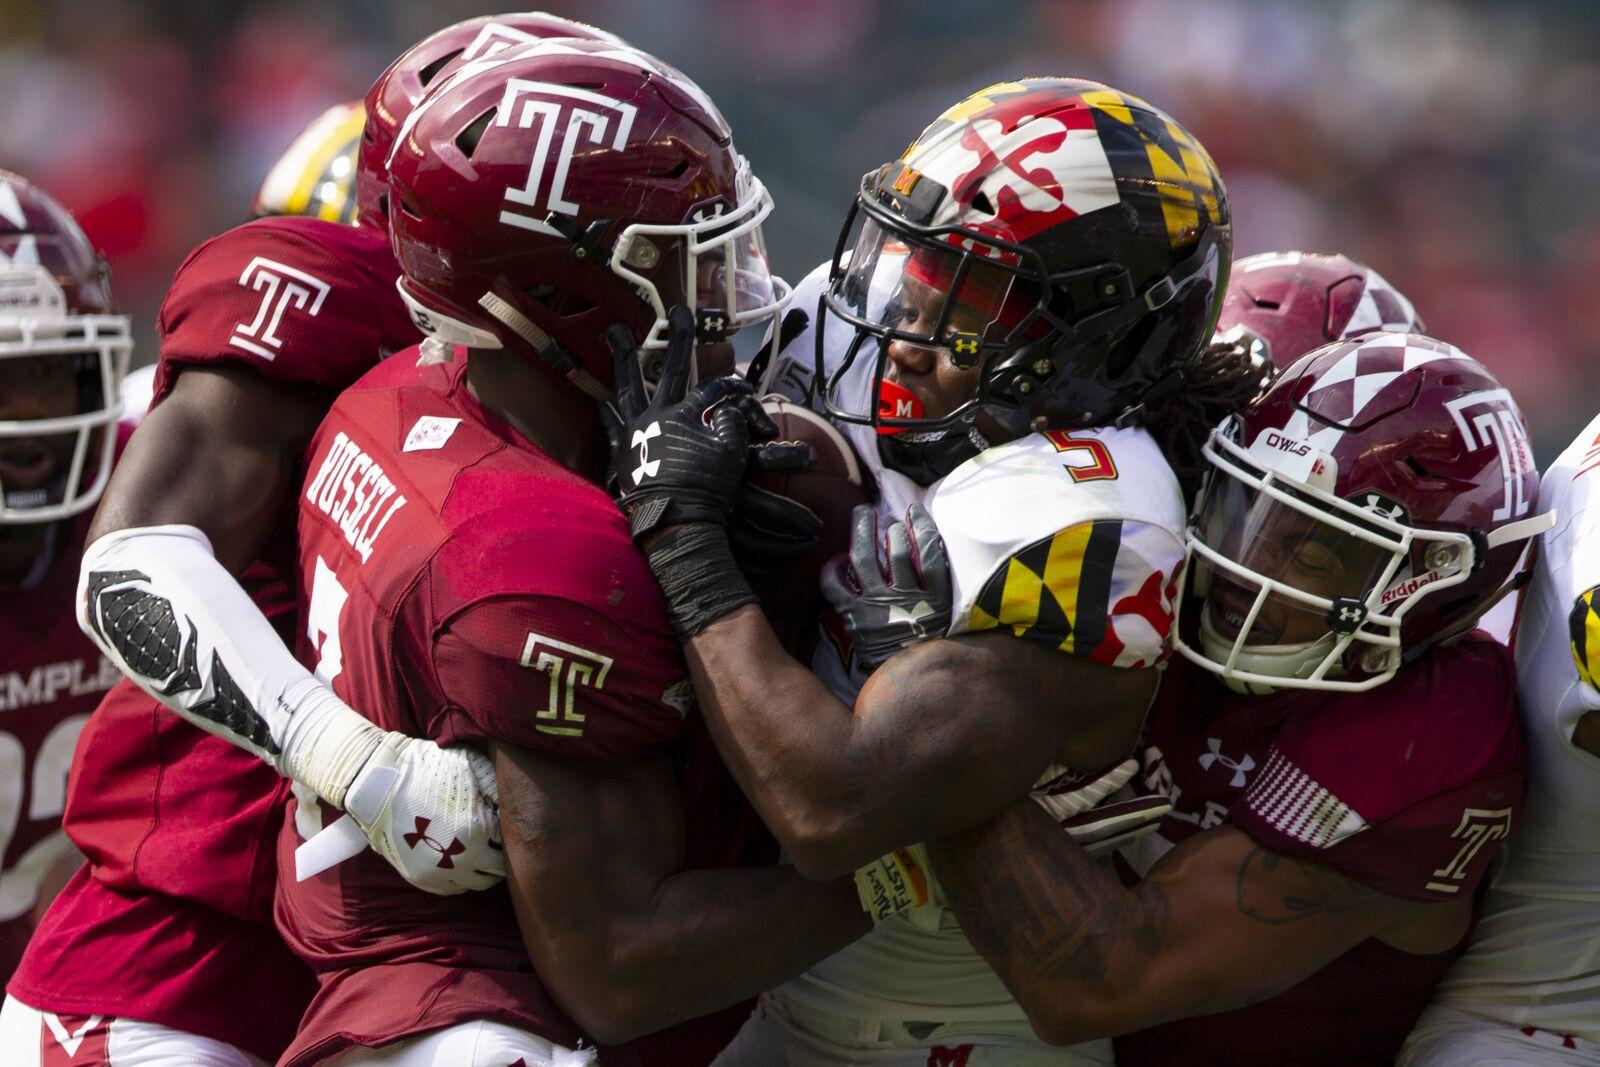 Big Ten Football Power Rankings, Week 4: Maryland, MSU suffer setbacks